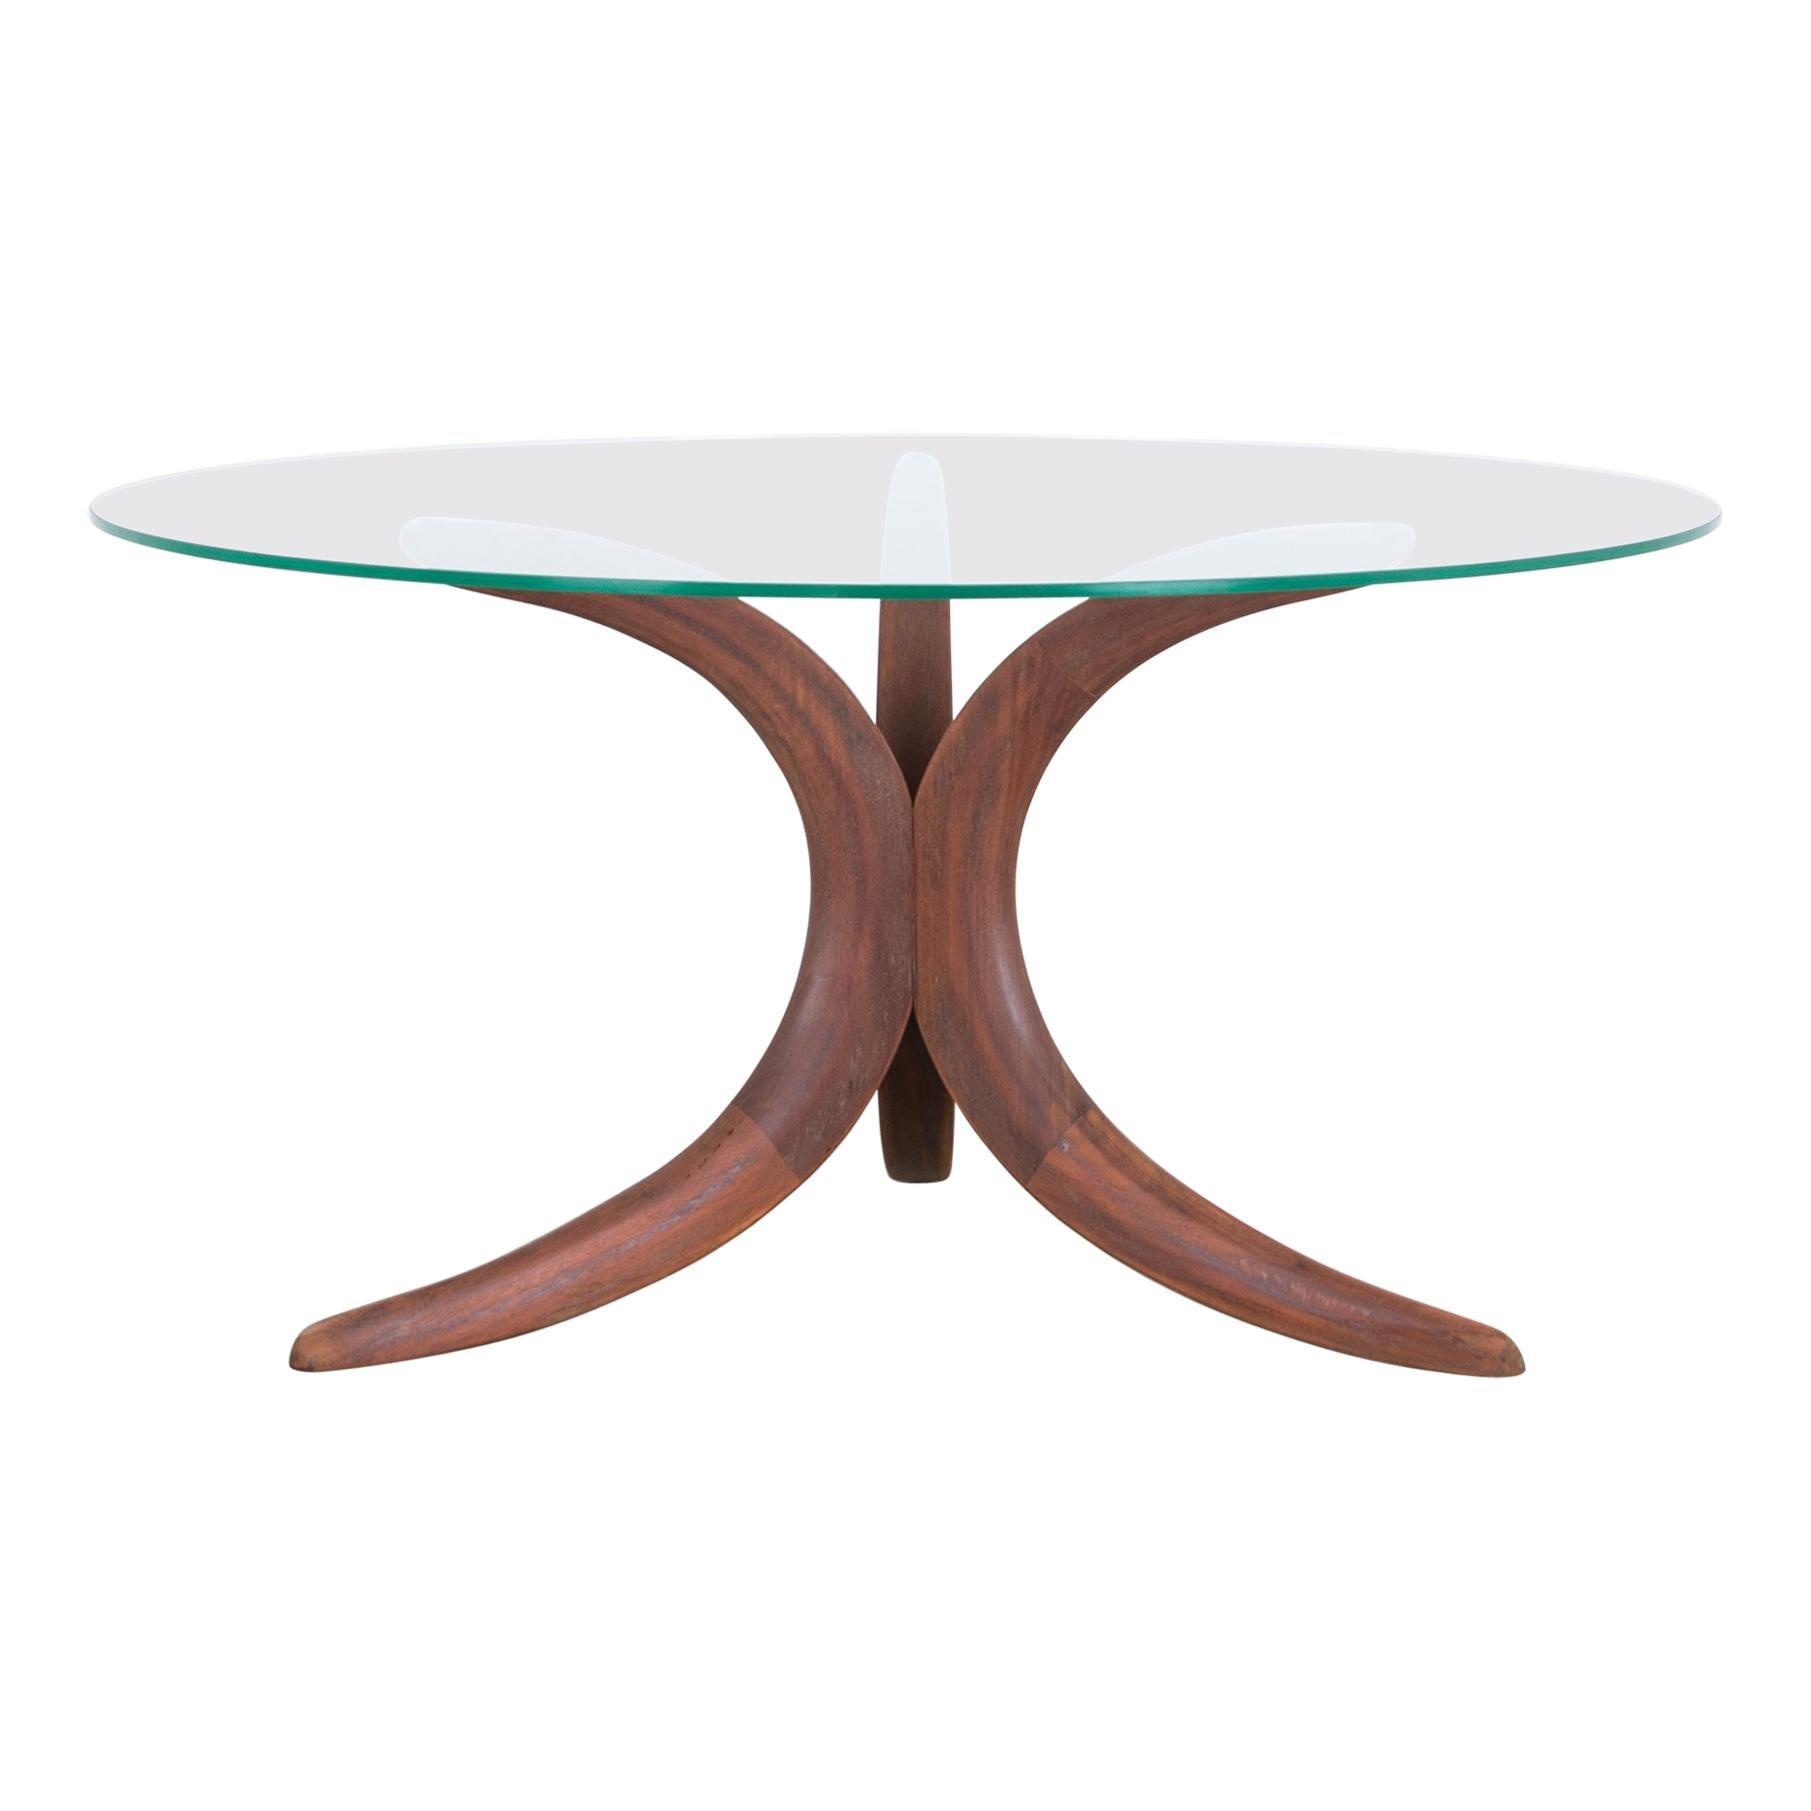 1960s Danish Modern Glass Coffee Table